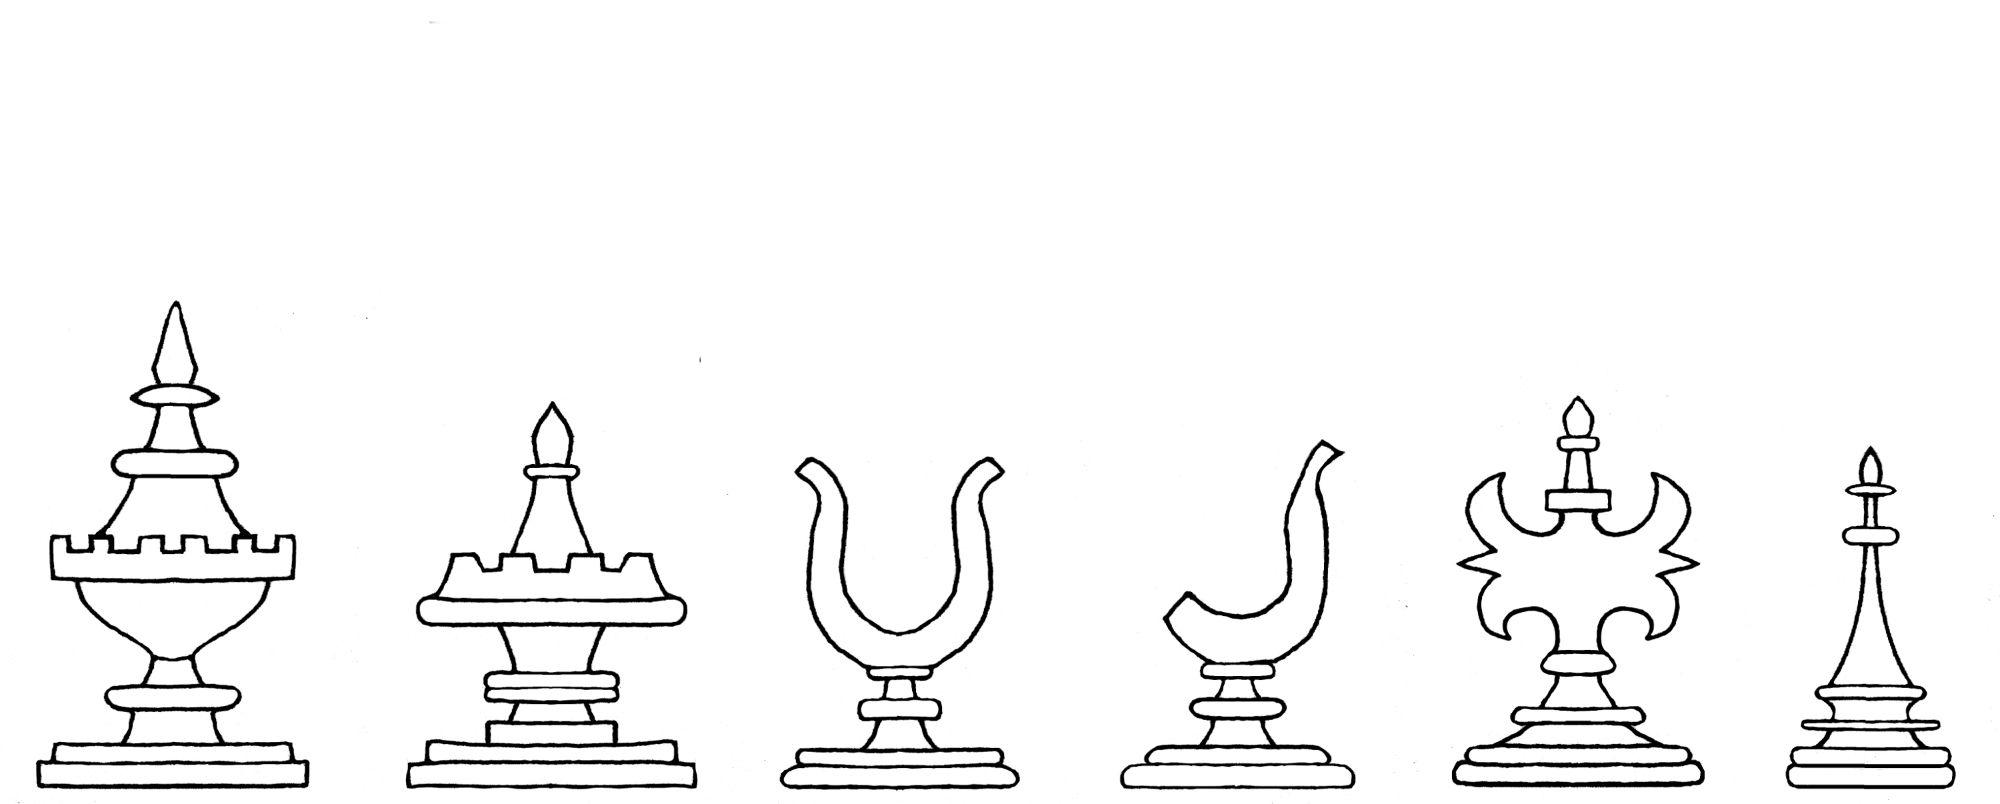 Kobel chess set number 2 interpretive diagram